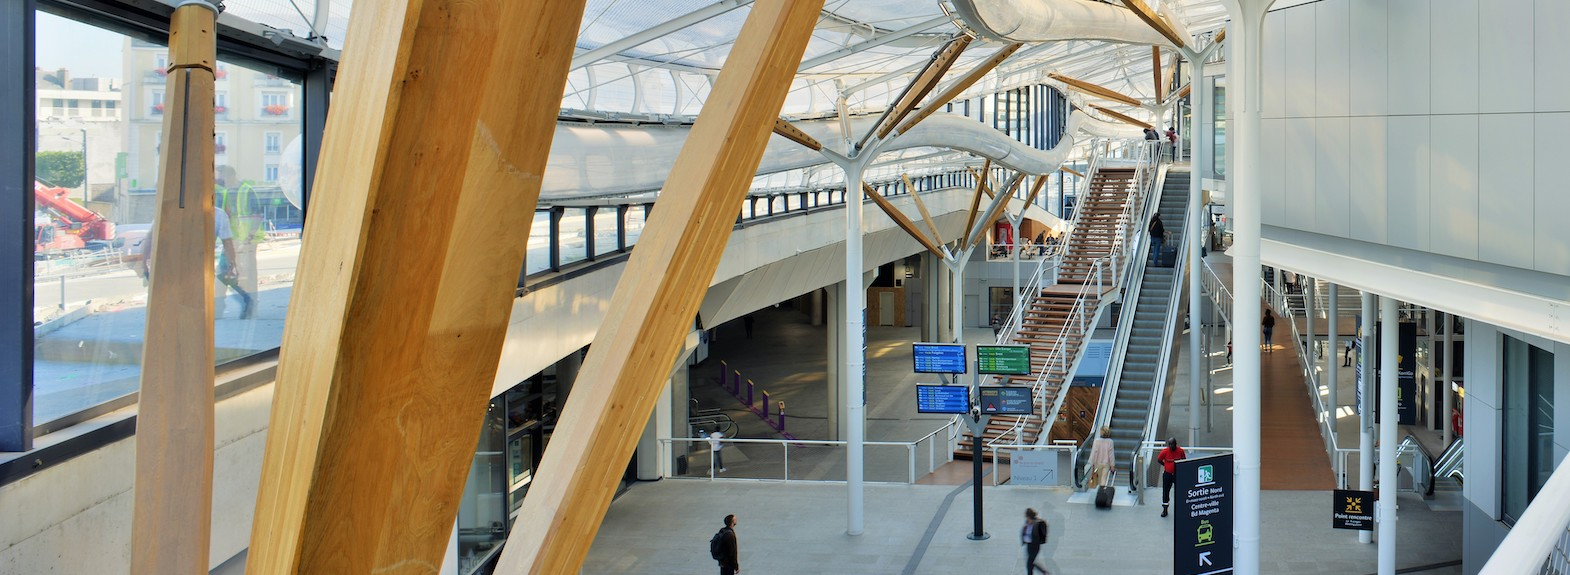 Gare_de_Rennes-Franck_Hamon-17501.jpg